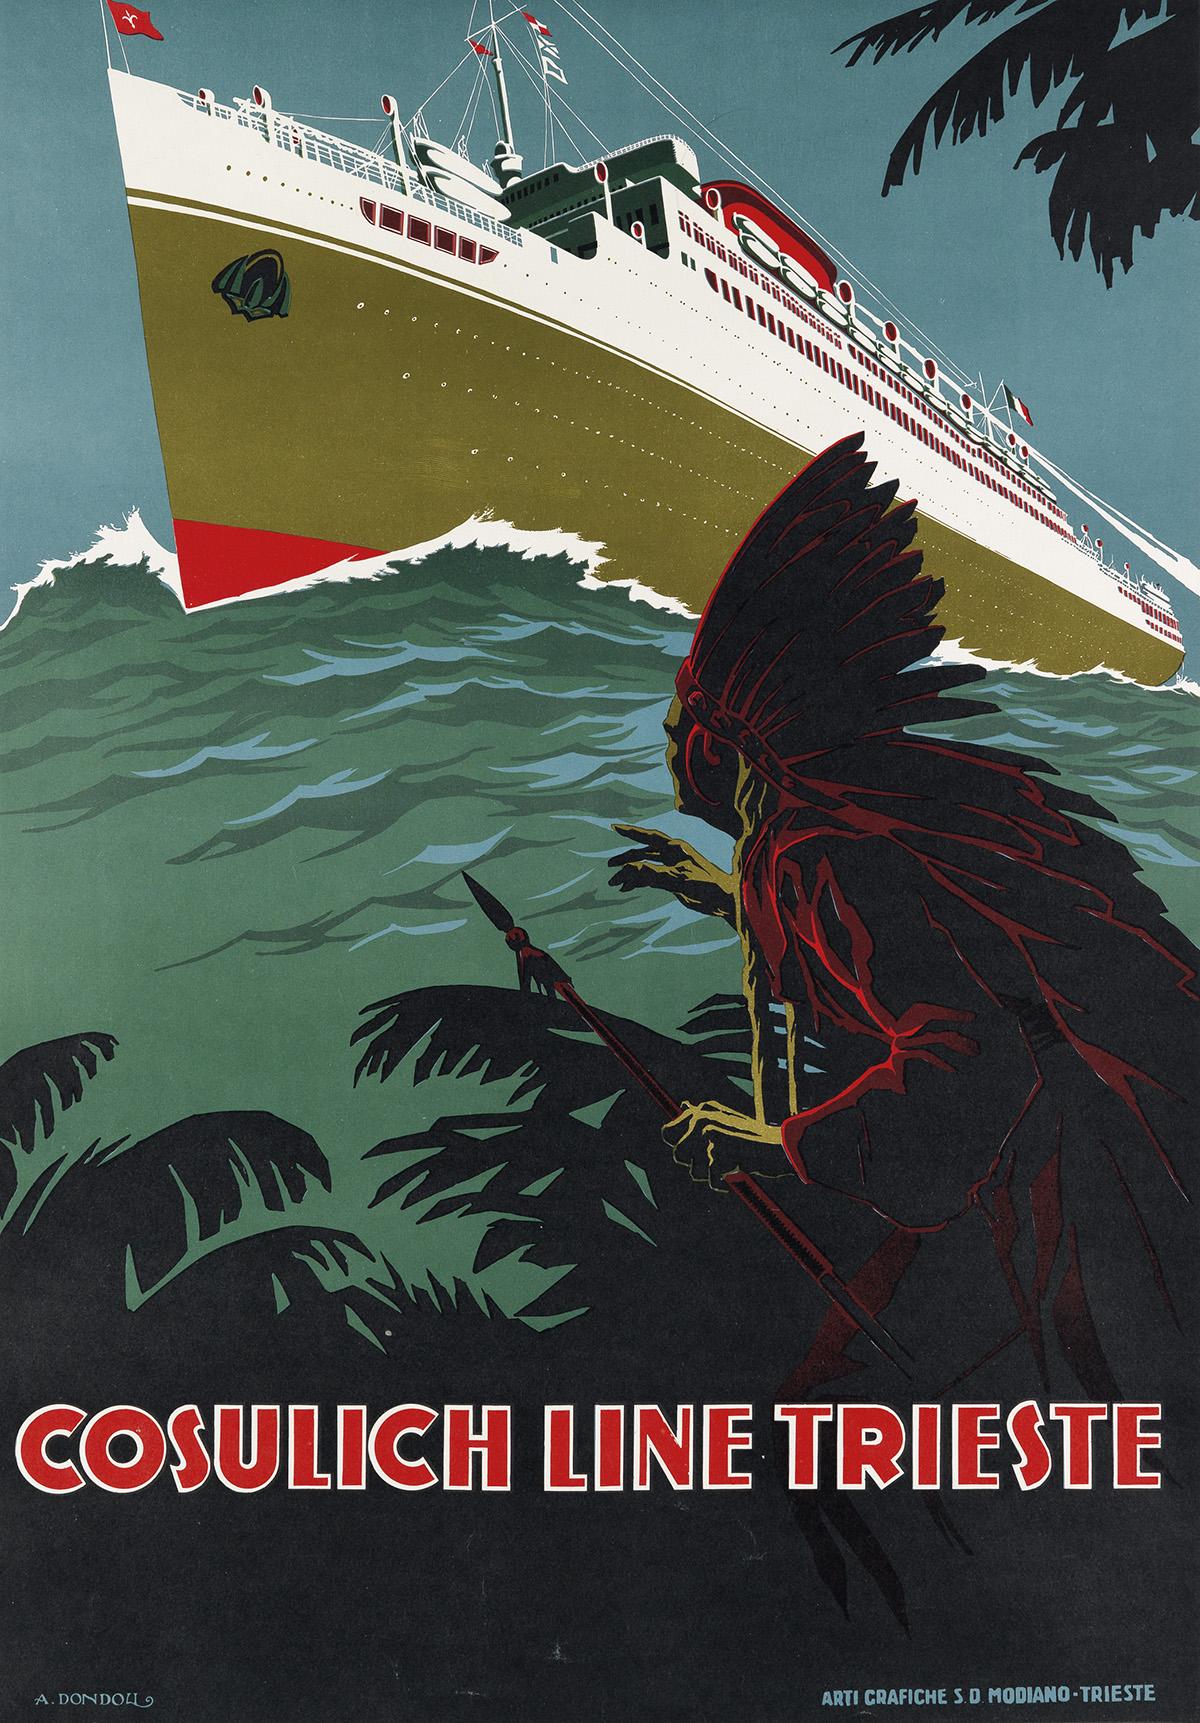 A-DONDOU-(DATES-UNKNOWN)-COSULICH-LINE-TRIESTE-Circa-1948-38